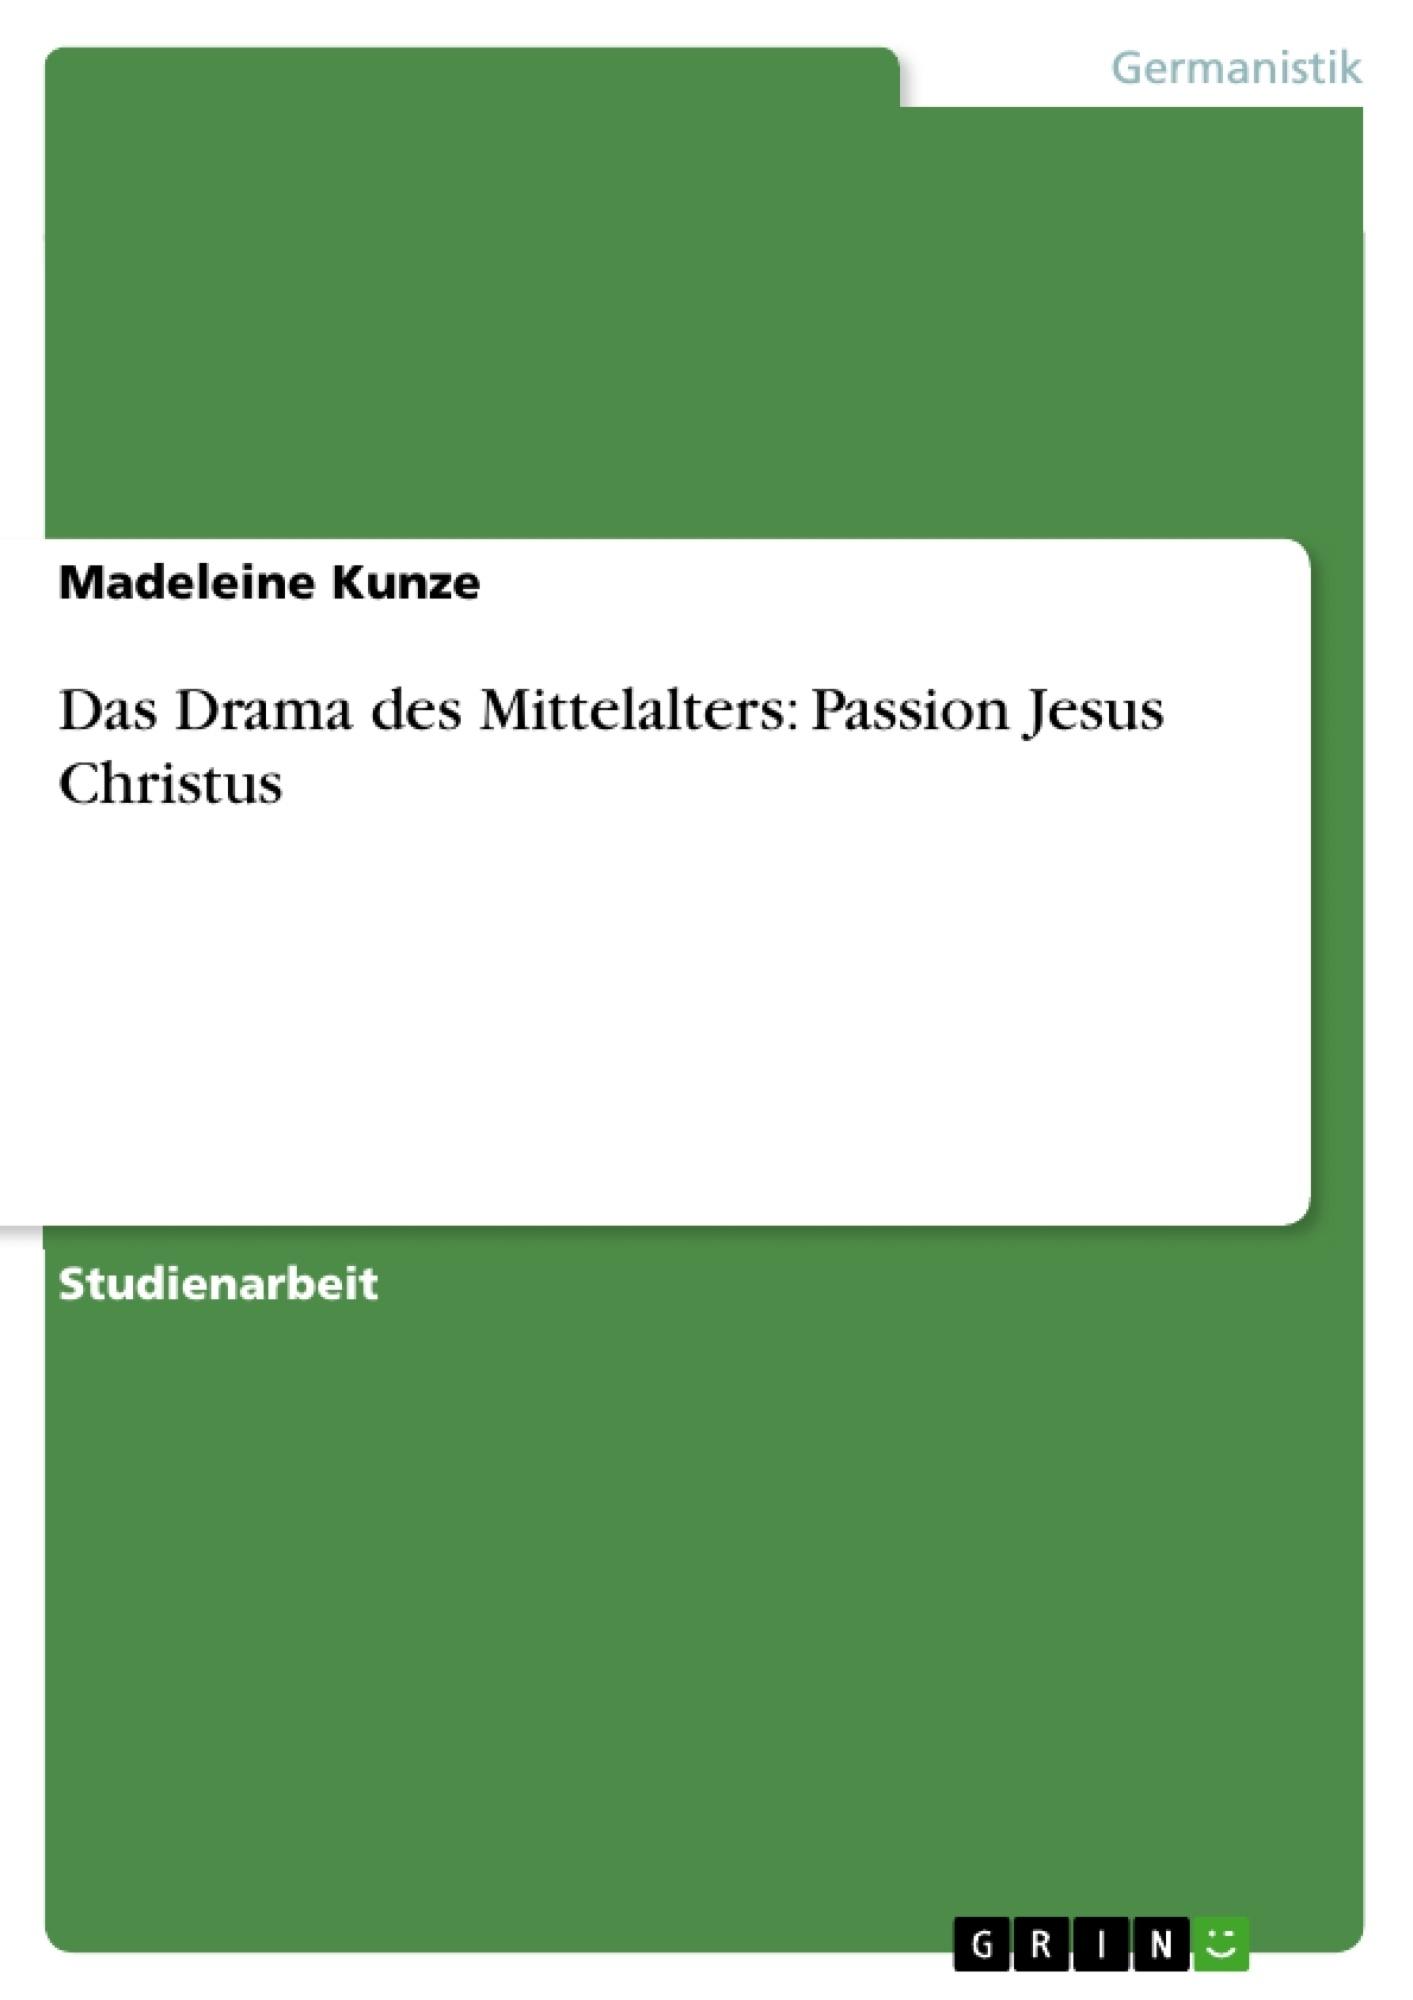 Titel: Das Drama des Mittelalters: Passion Jesus Christus